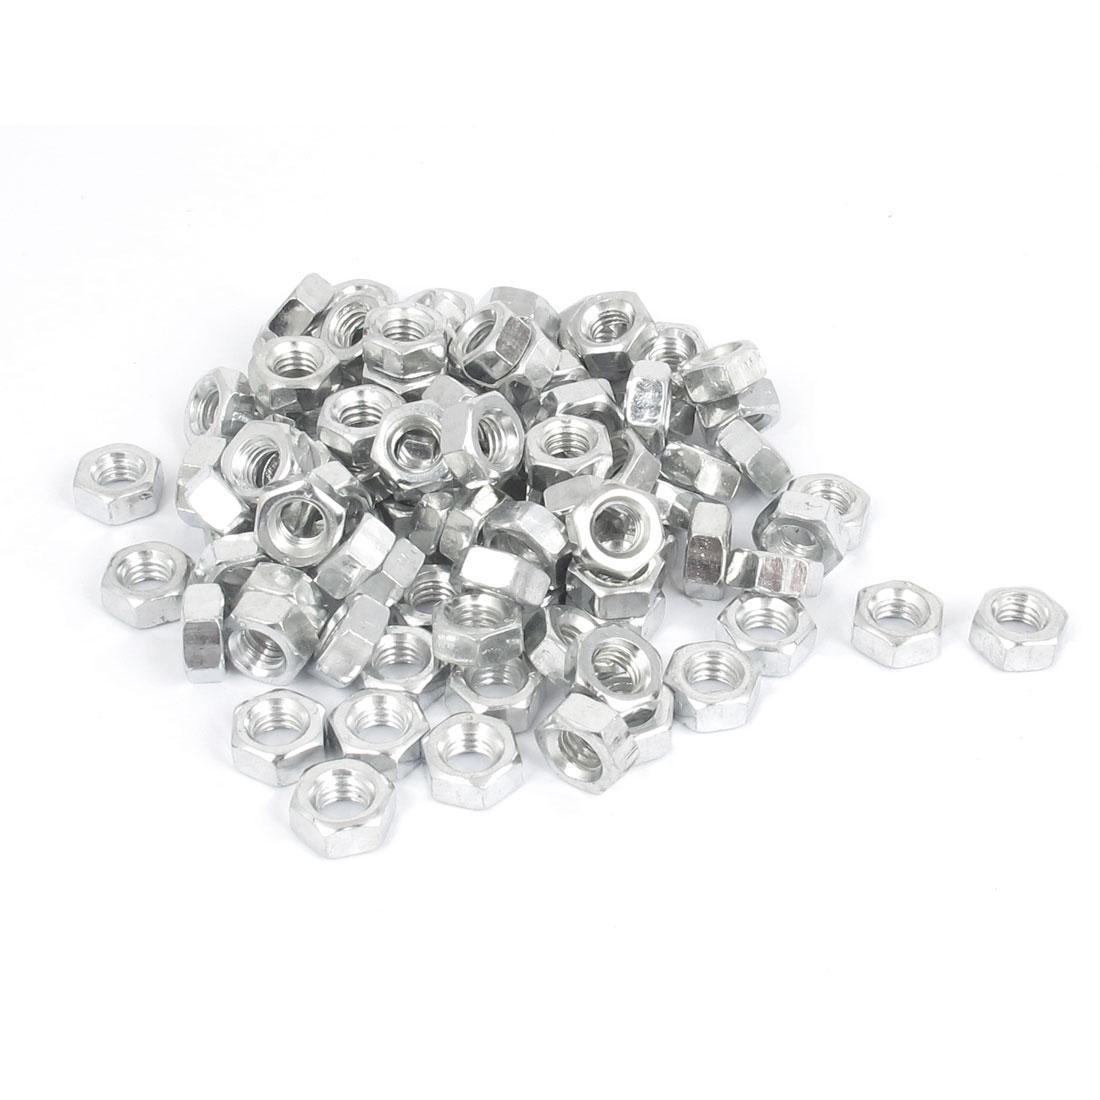 100 Pcs M6 Metal Machine Screw Hex Hexagon Nut DIN 934